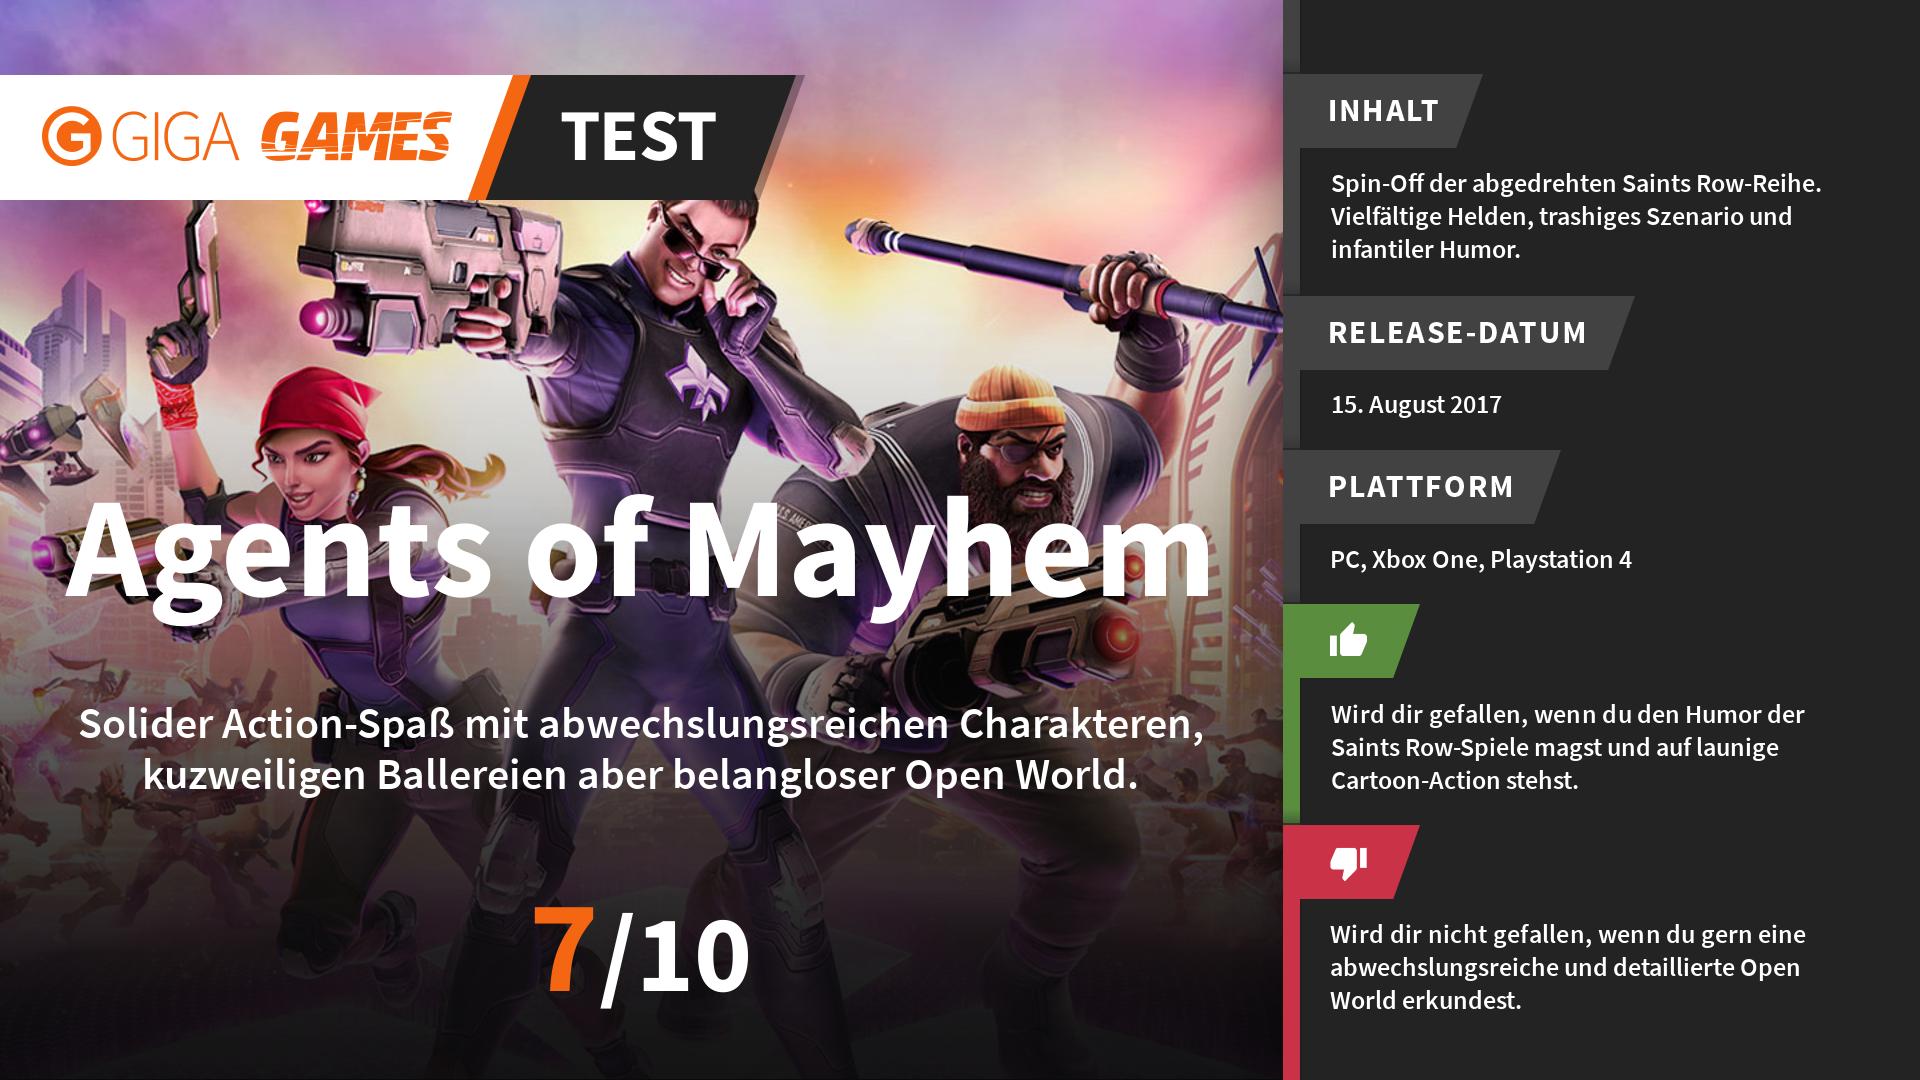 Agents of Mayhem - Neuer Trailer